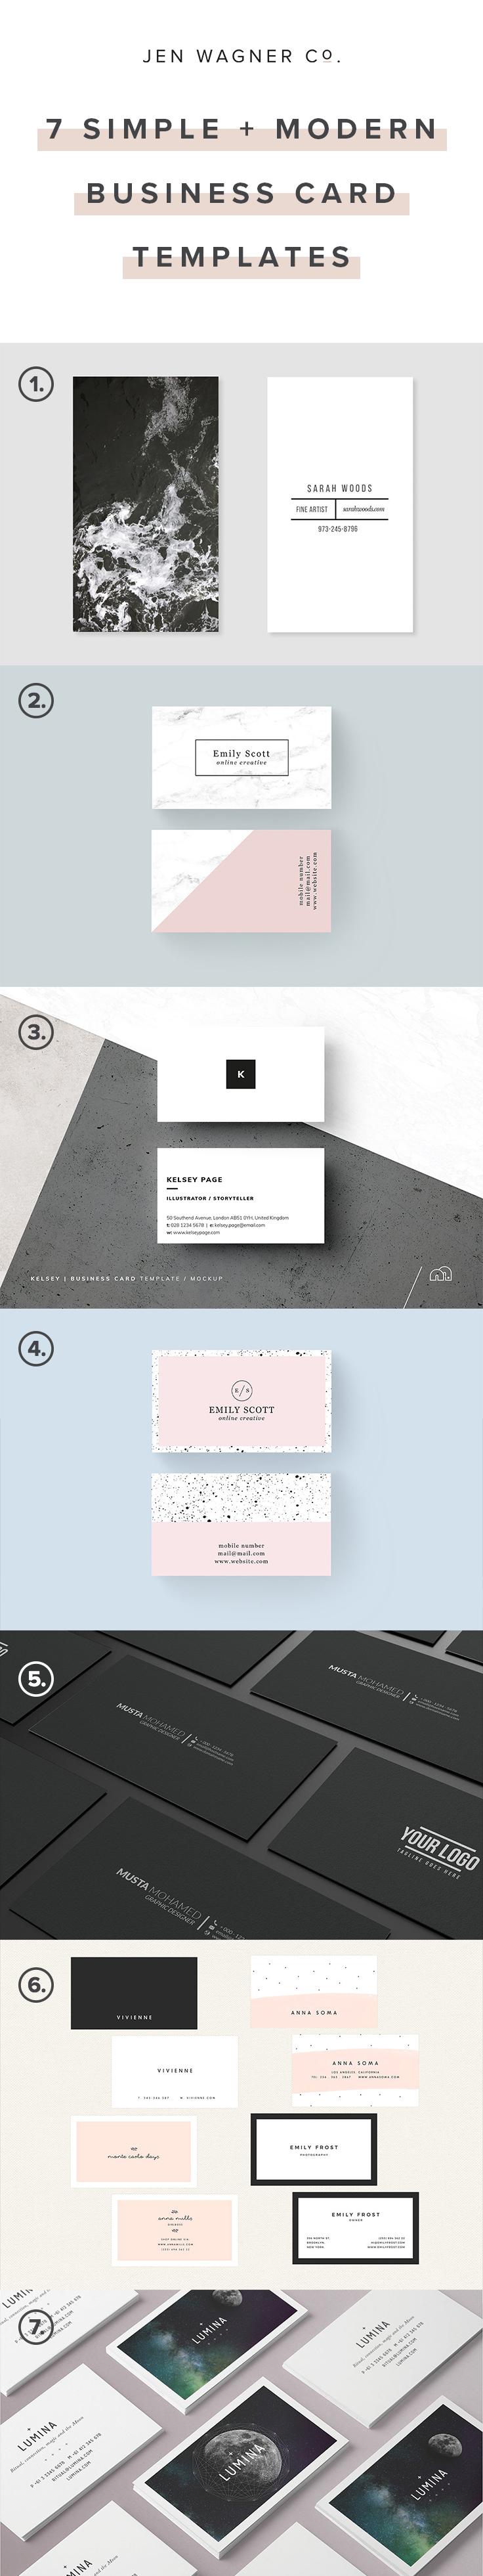 7 Simple + Modern Business Card Templates.jpg